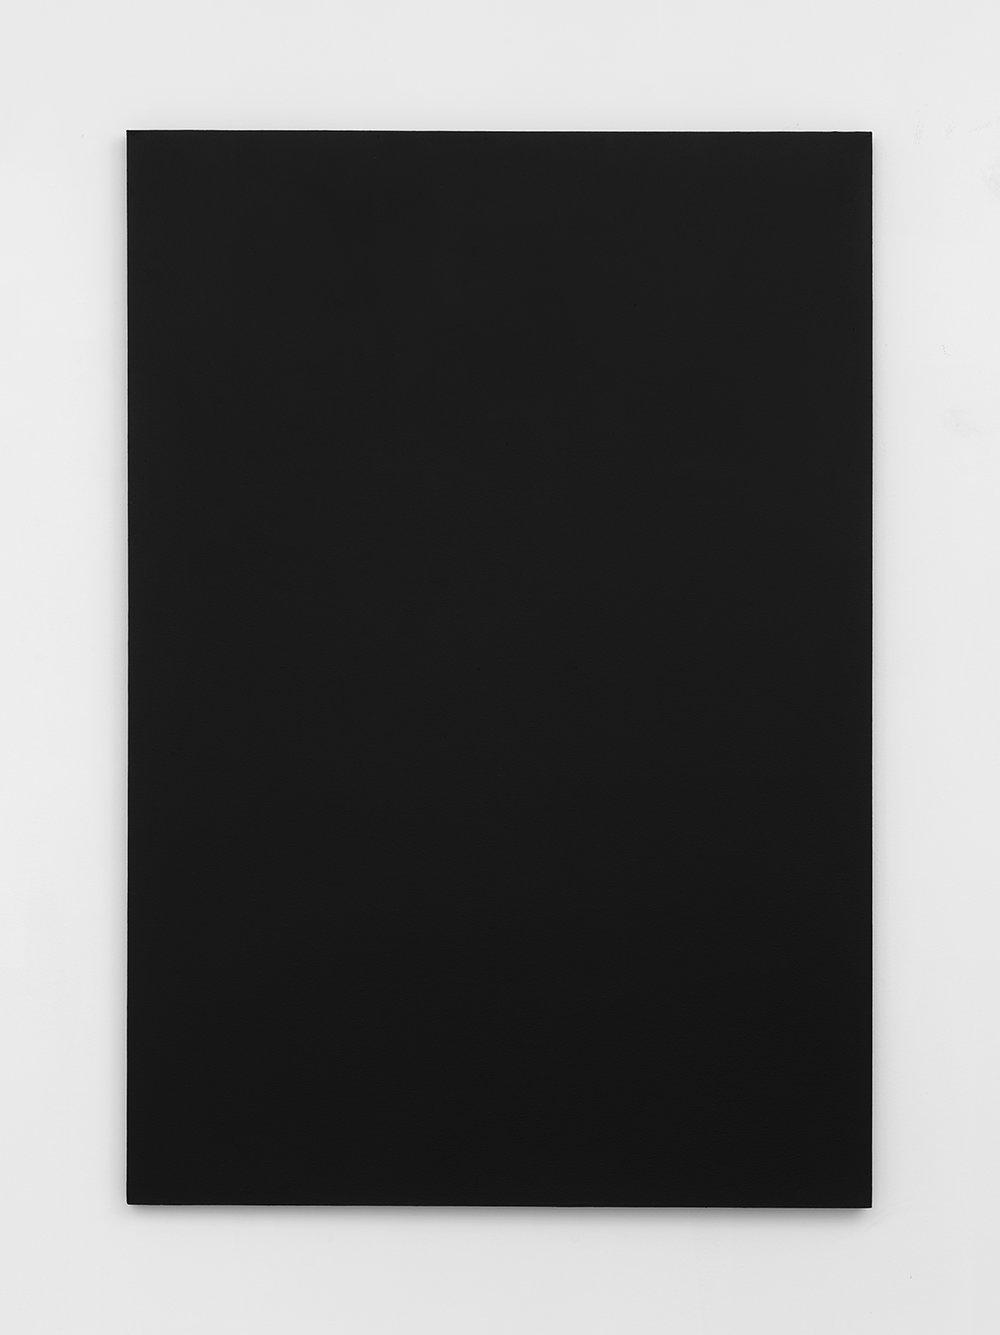 Joshua Evan,  Shielding Monochrome #1 , EMF shielding paint on canvas, 2017, courtesy ASHES/ASHES